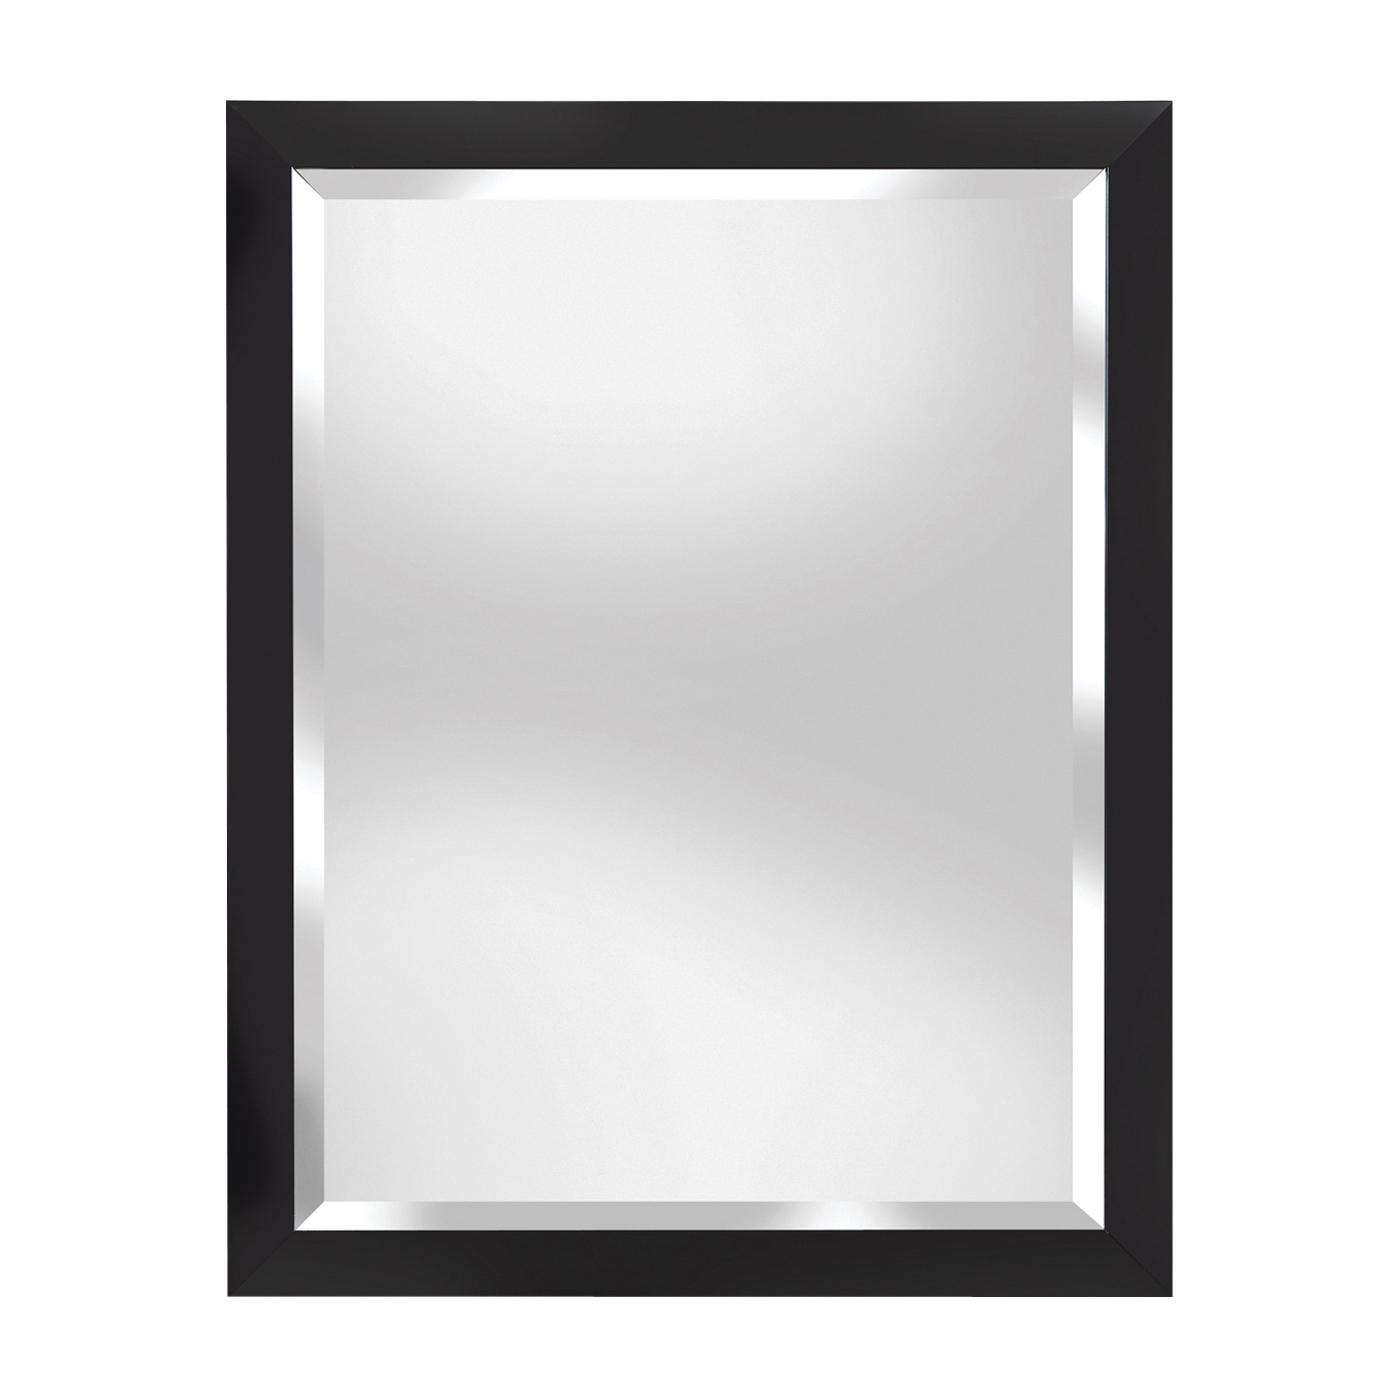 Picture of RENIN 200359 Angels Pathway Framed Mirror, 28 in W, 22 in H, Rectangular, Espresso Frame